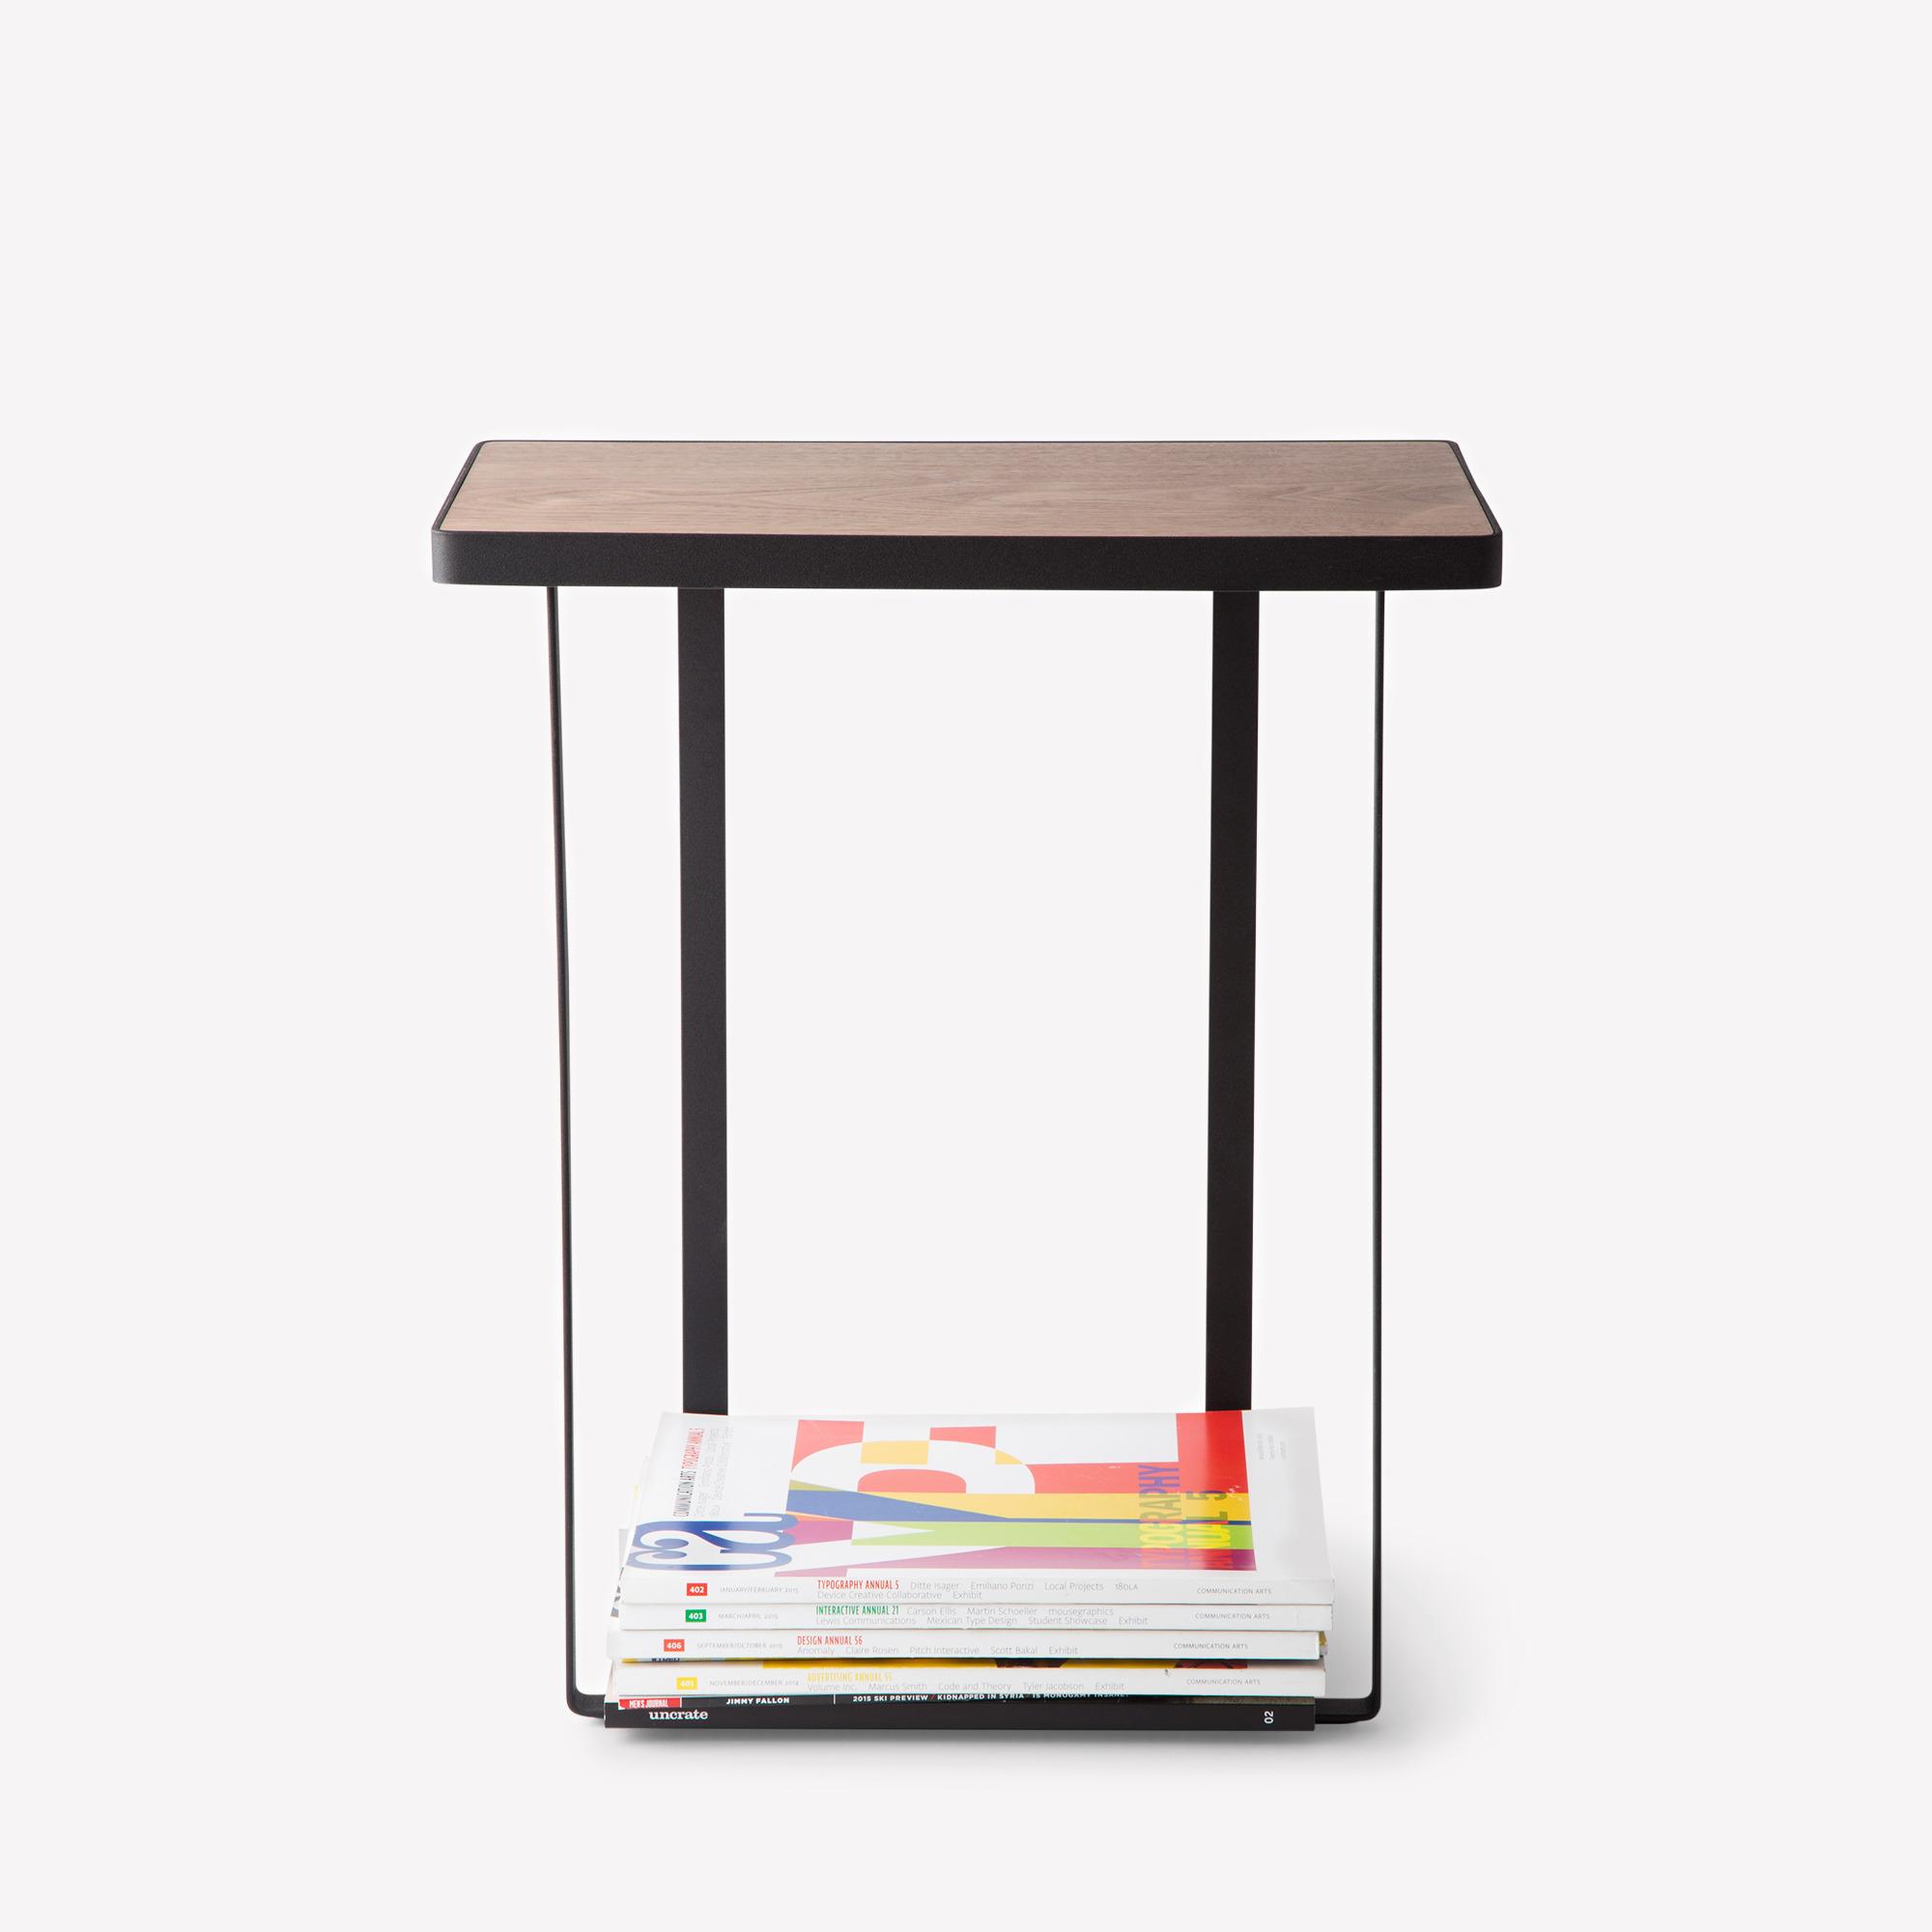 Black Steel & Wood Table with Magazine Holder